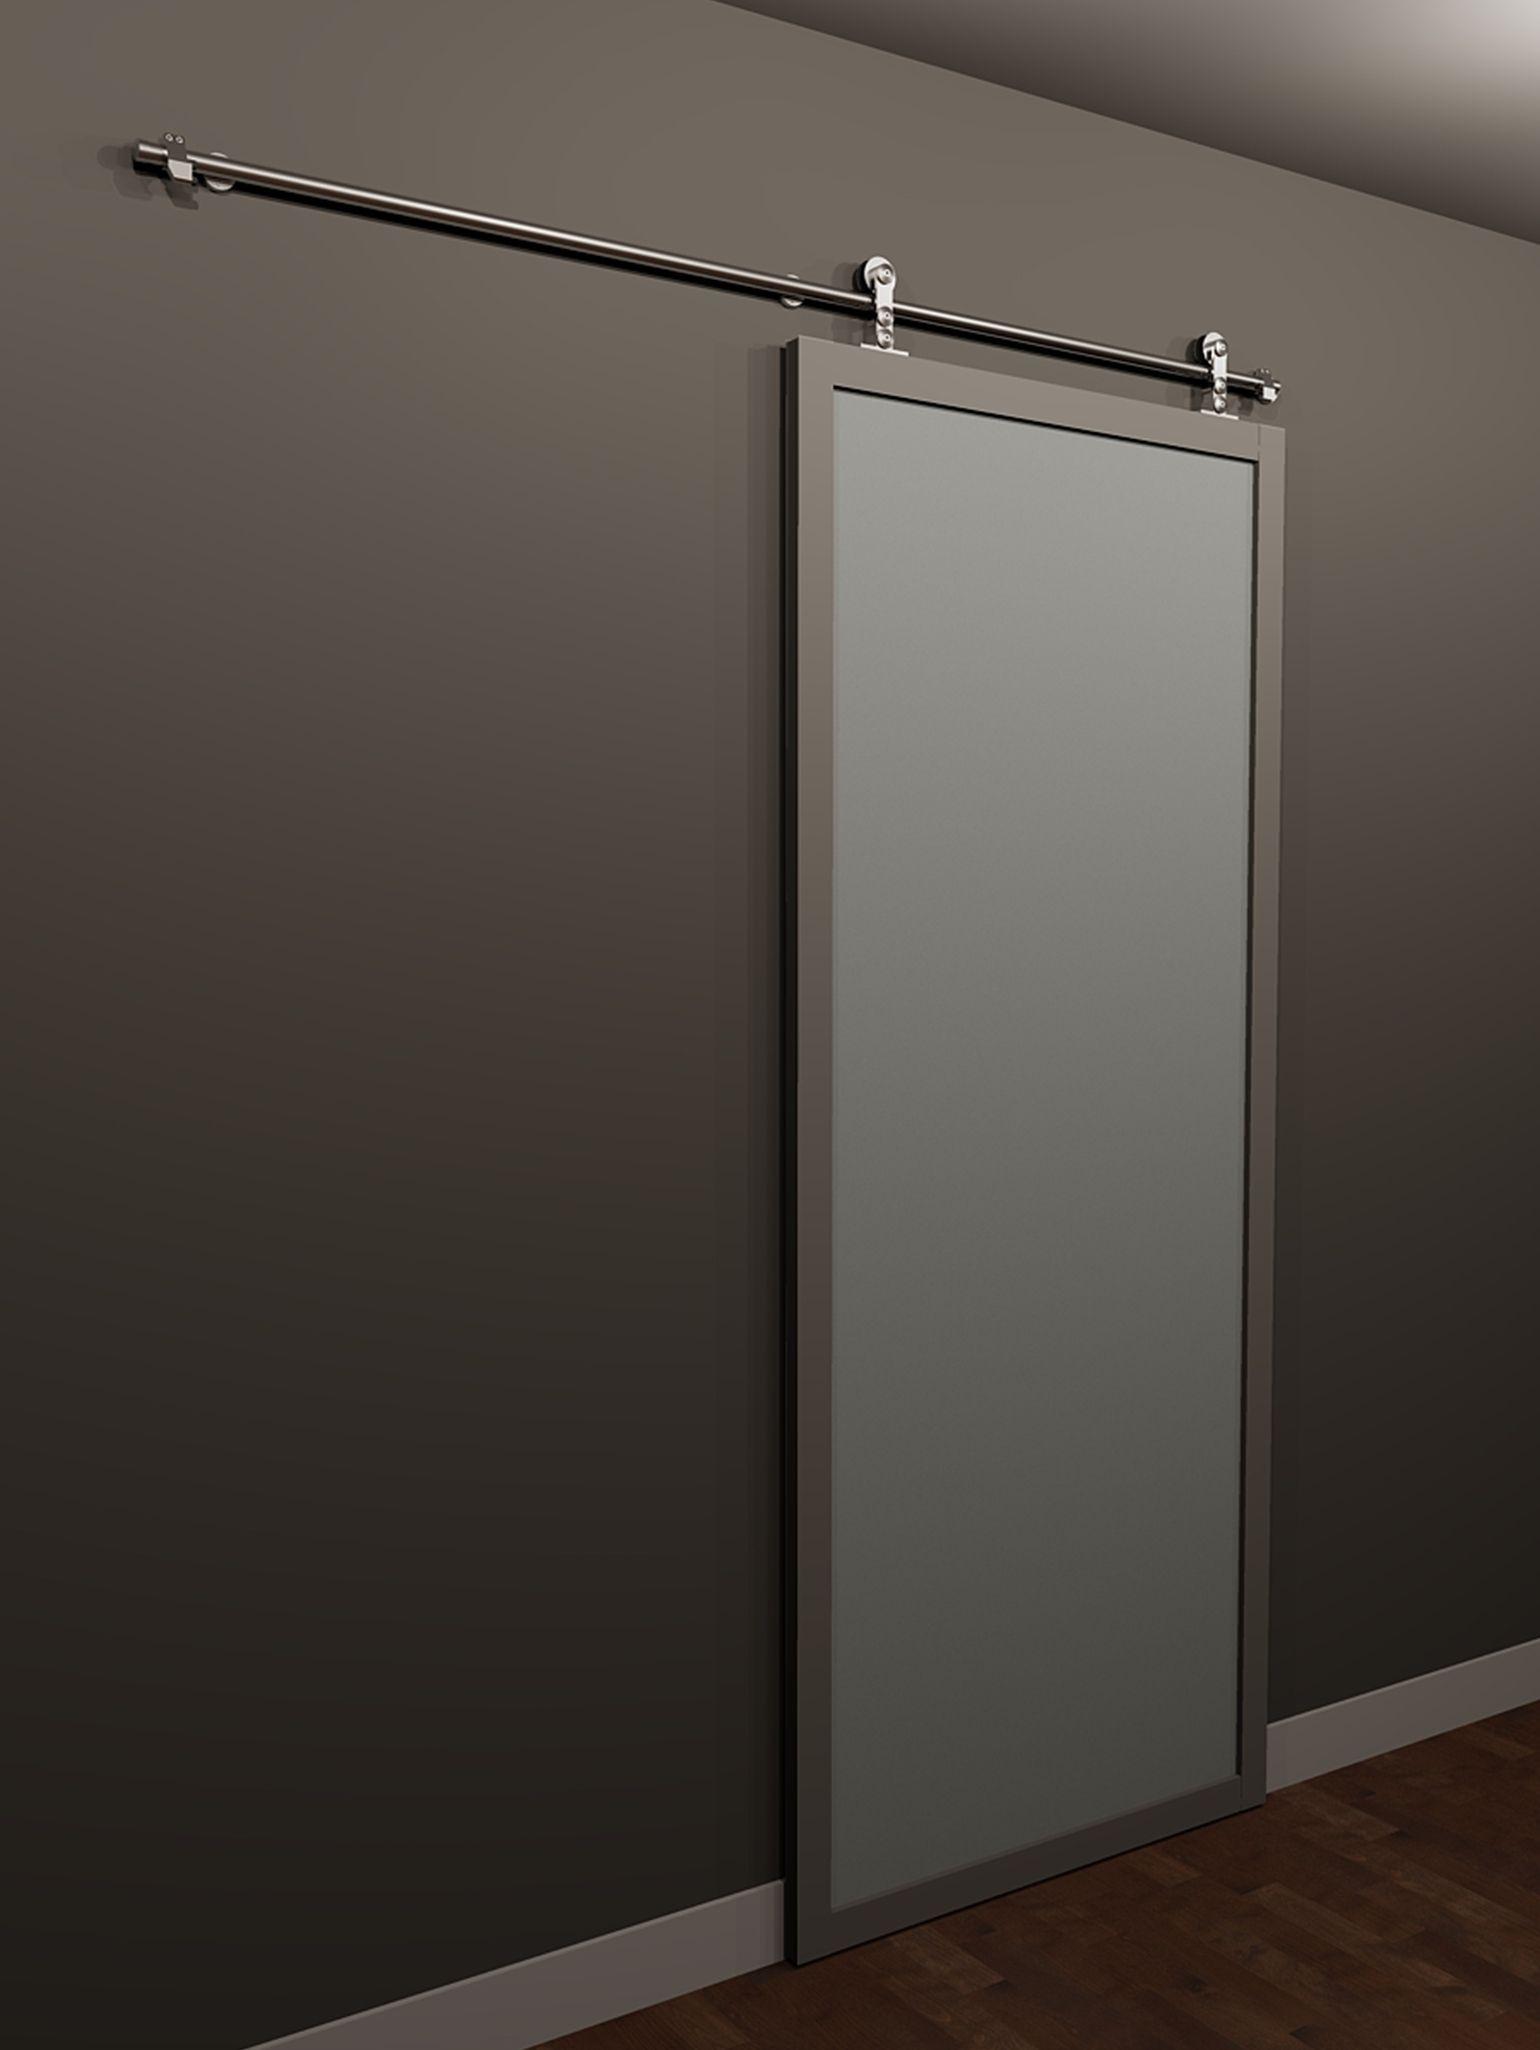 Single Sliding Glass Door Hanging Sliding Doors Sliding Door Wardrobe Designs Glass Doors Interior